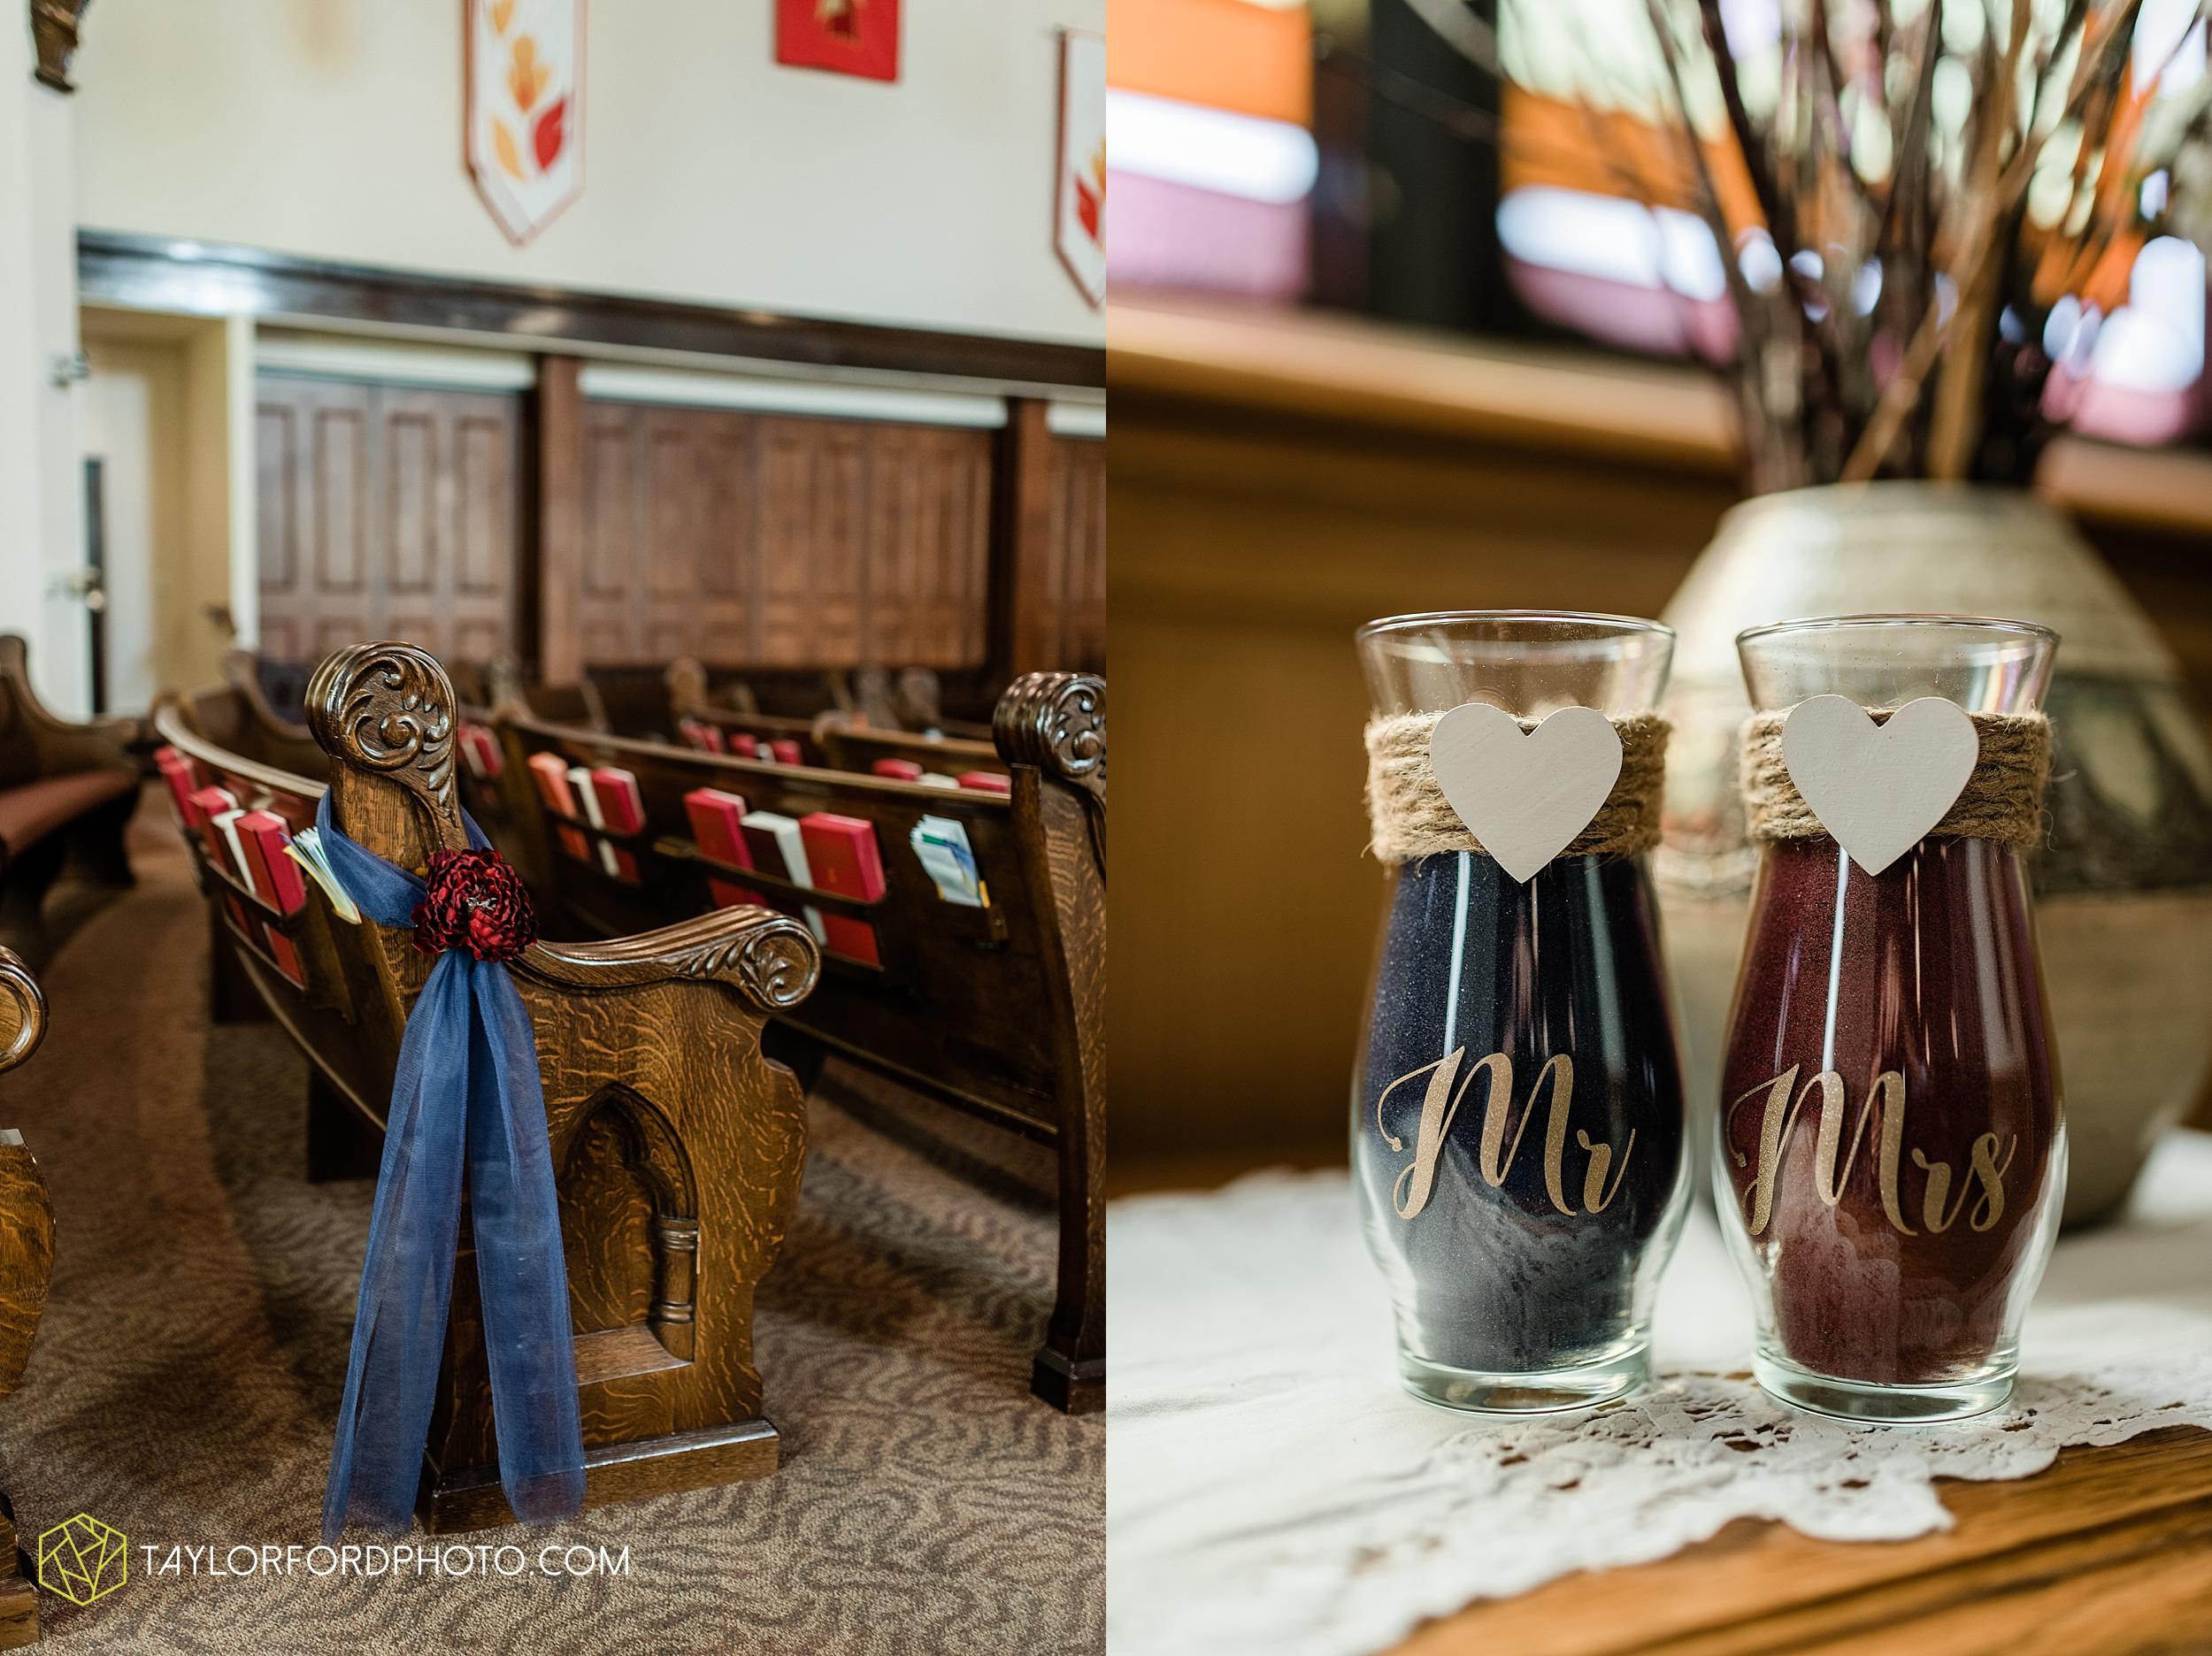 chelsey-zosh-jackson-young-first-united-methodist-church-senior-center-van-wert-ohio-wedding-photographer-taylor-ford-photography_0050.jpg